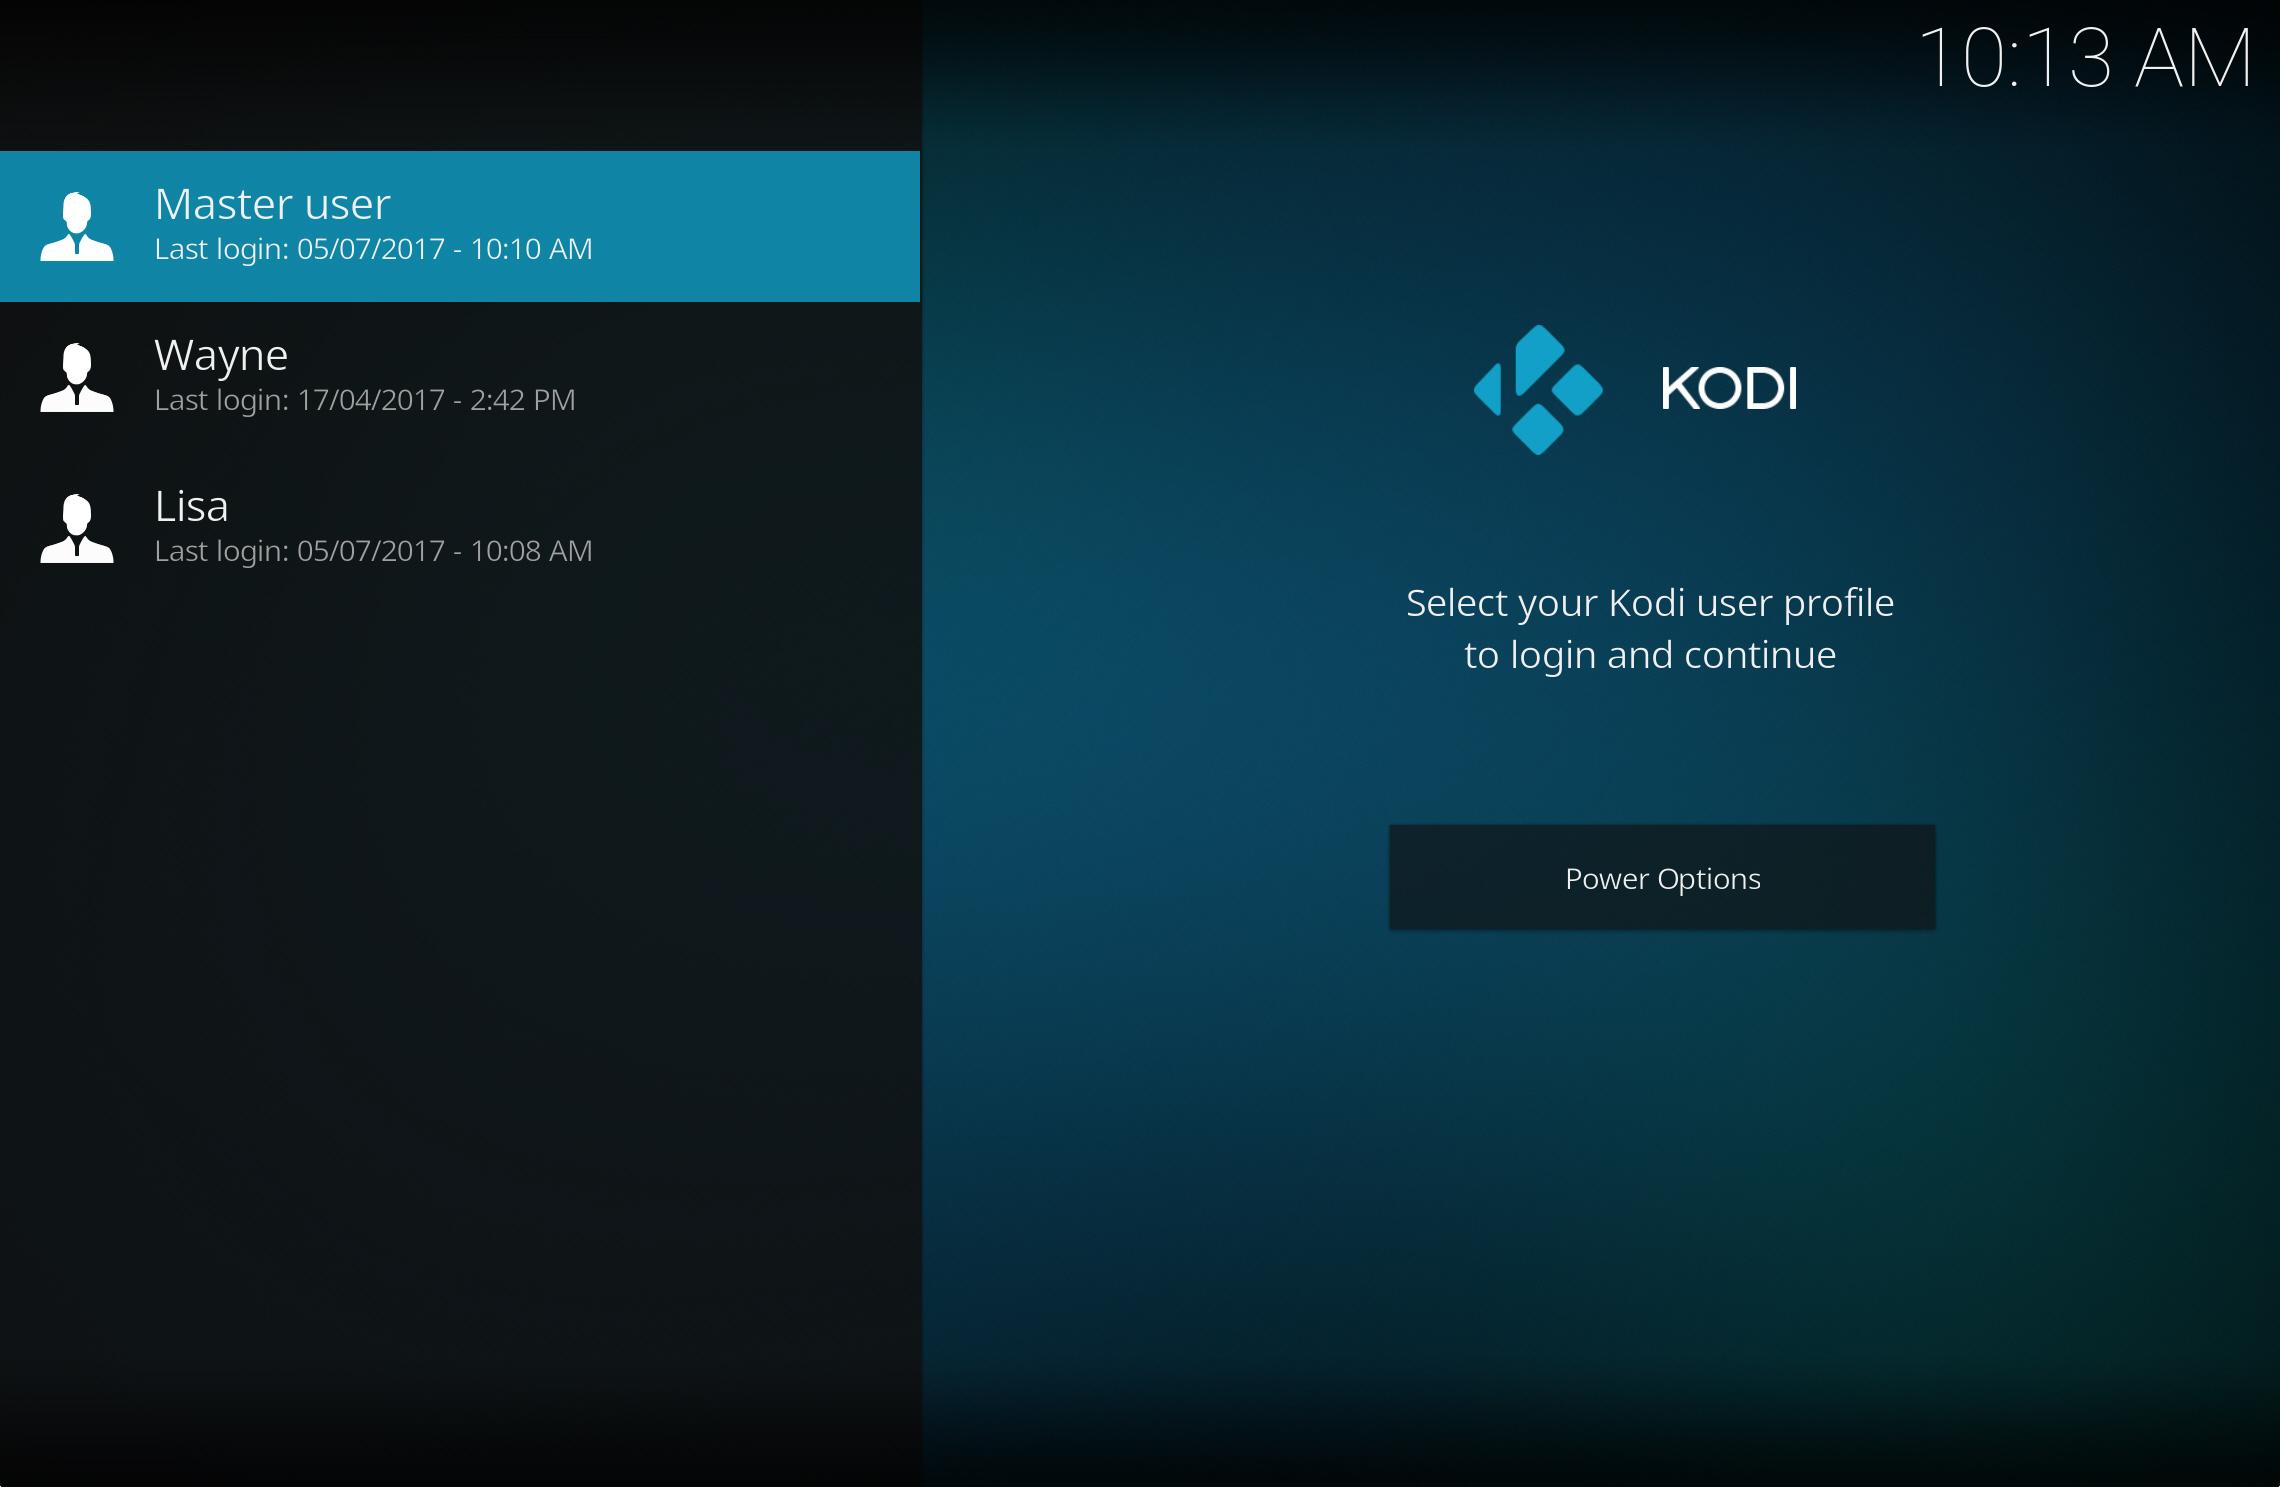 Kodi profiles